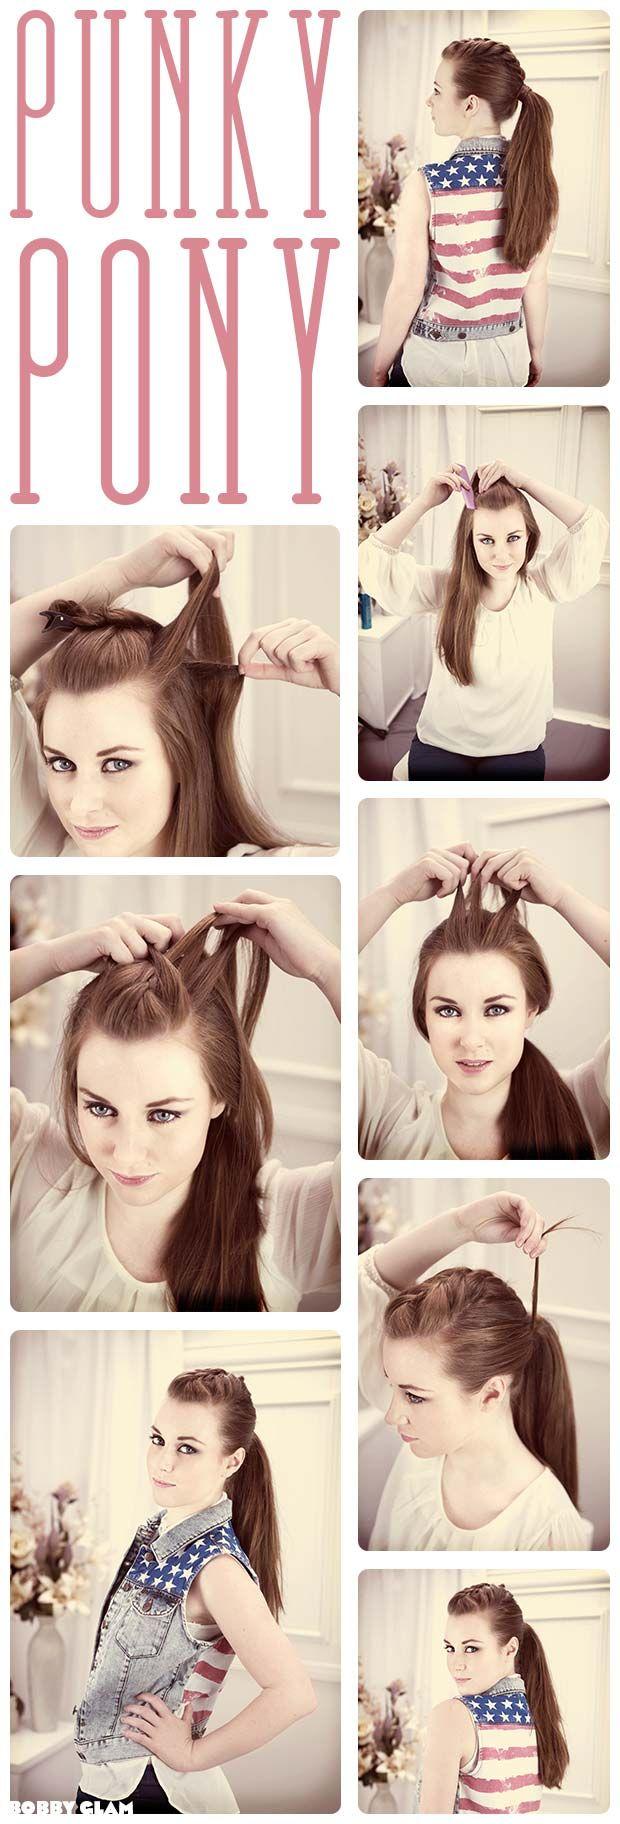 Punky #ponytail #hair #hairdo #hairstyles #hairstylesforlonghair #hairtips #tutorial #DIY #stepbystep #longhair #howto #guide #everydayhairstyle #easyhairstyle #braid #hairextensions